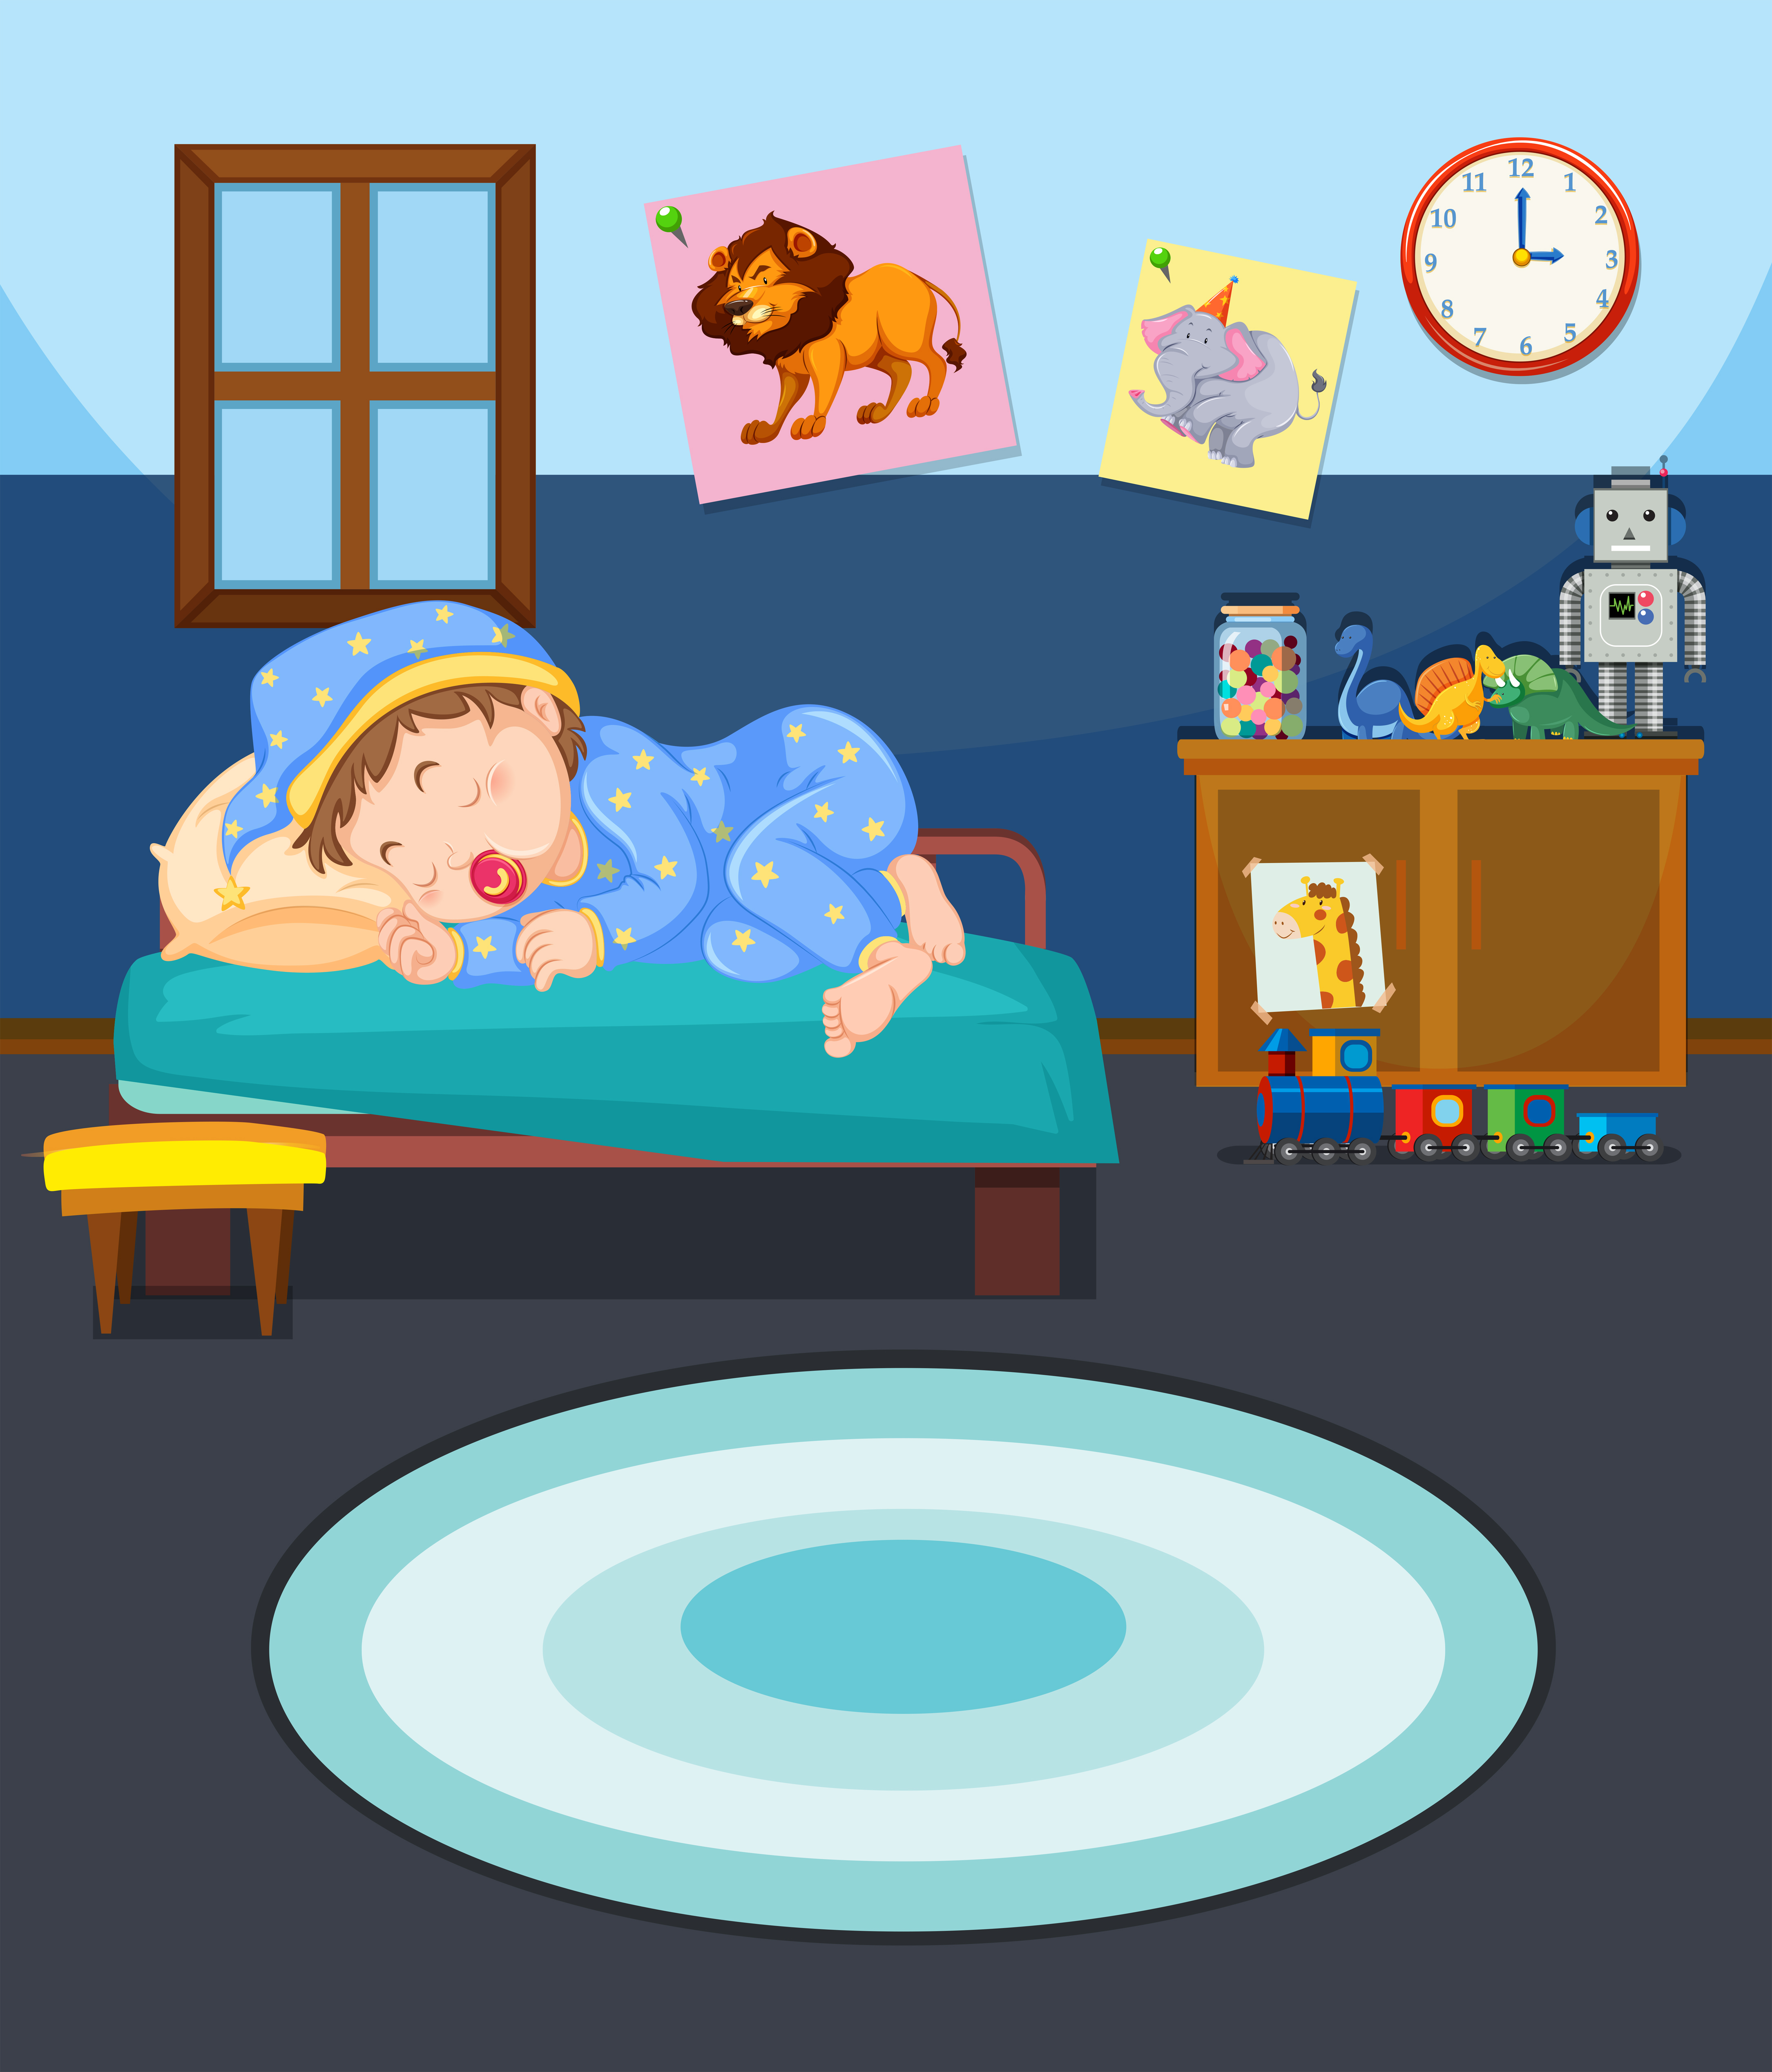 Young boy sleeping scene - Download Free Vectors, Clipart